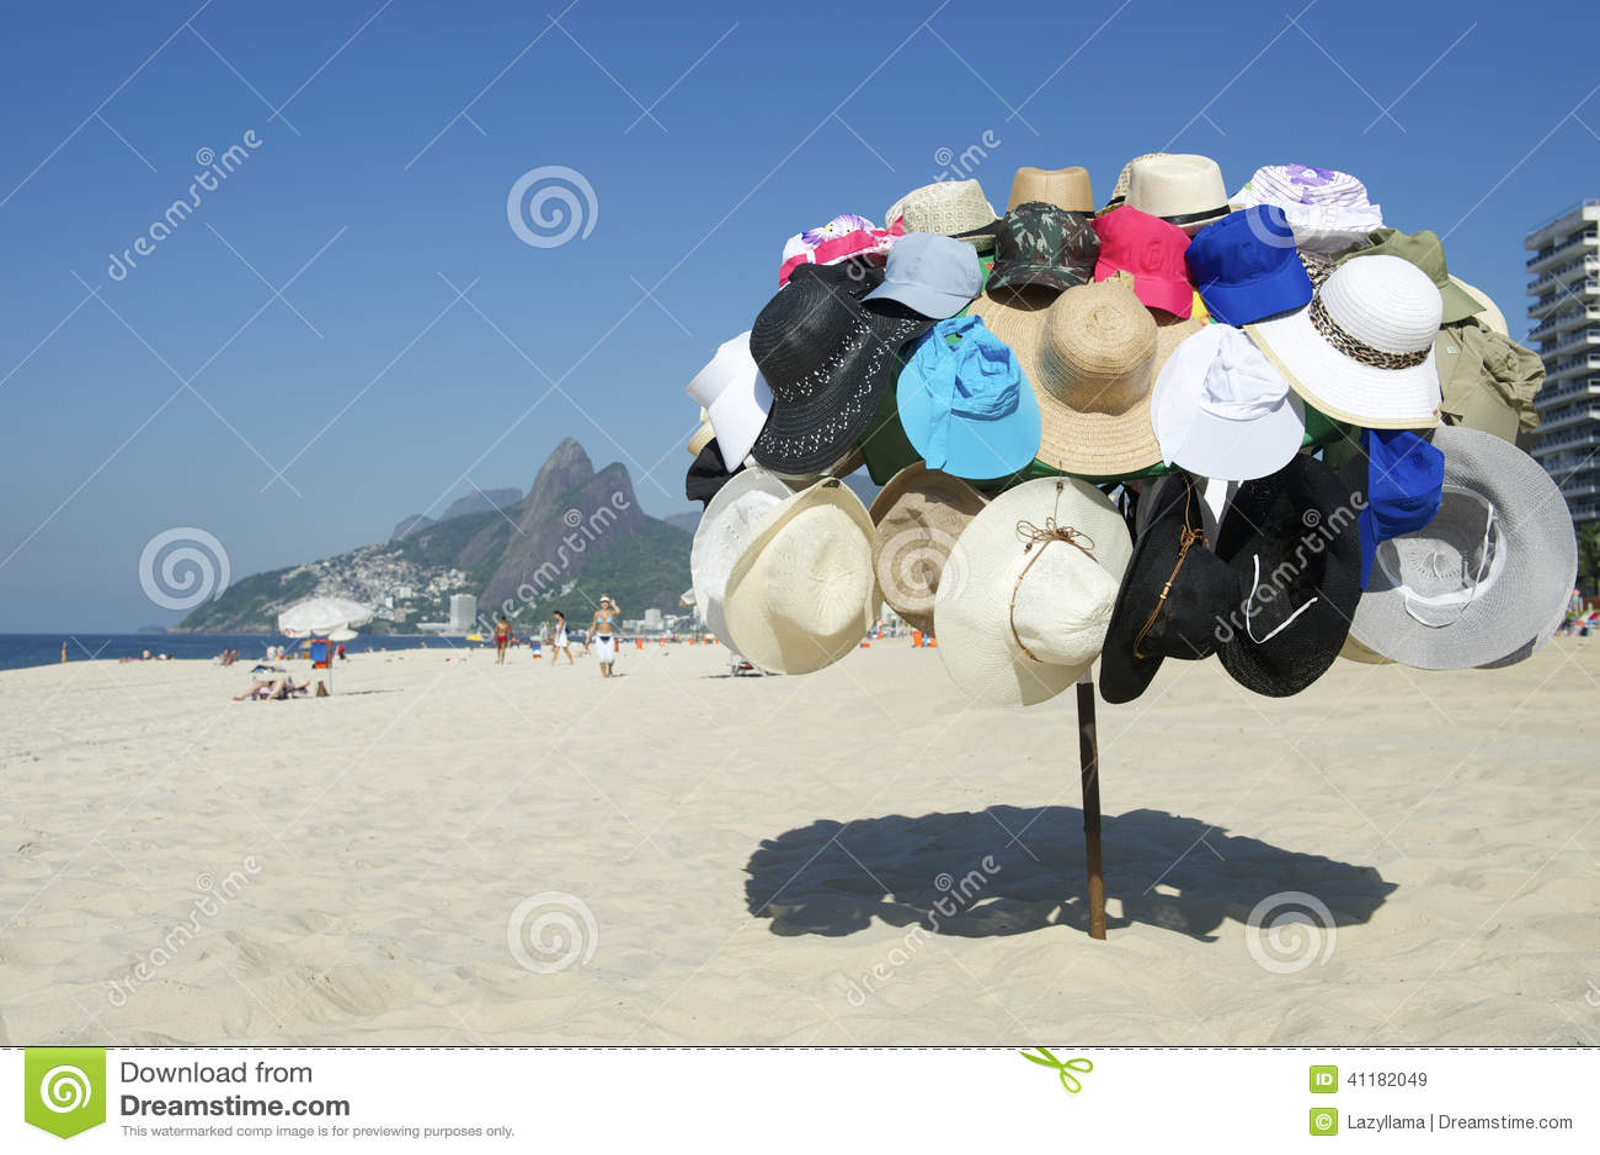 Display of beach vendor selling hats on Ipanema Beach Rio de Janeiro Brazil b90dc967797